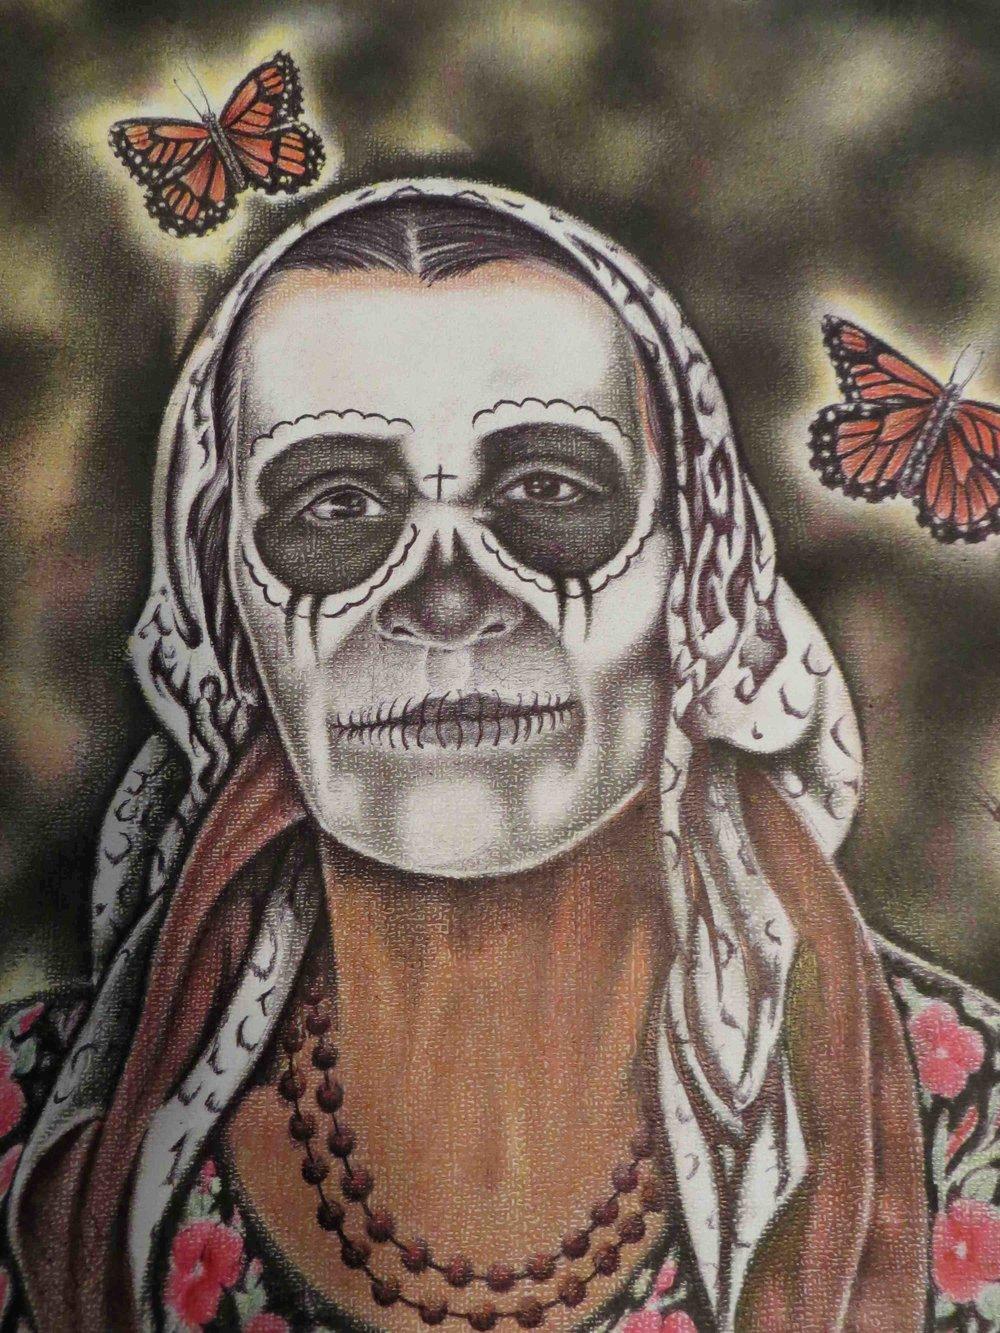 Dios de la Muerte pastel and ink drawing 9-3/4 x 12 by Uvaldo Nevarez